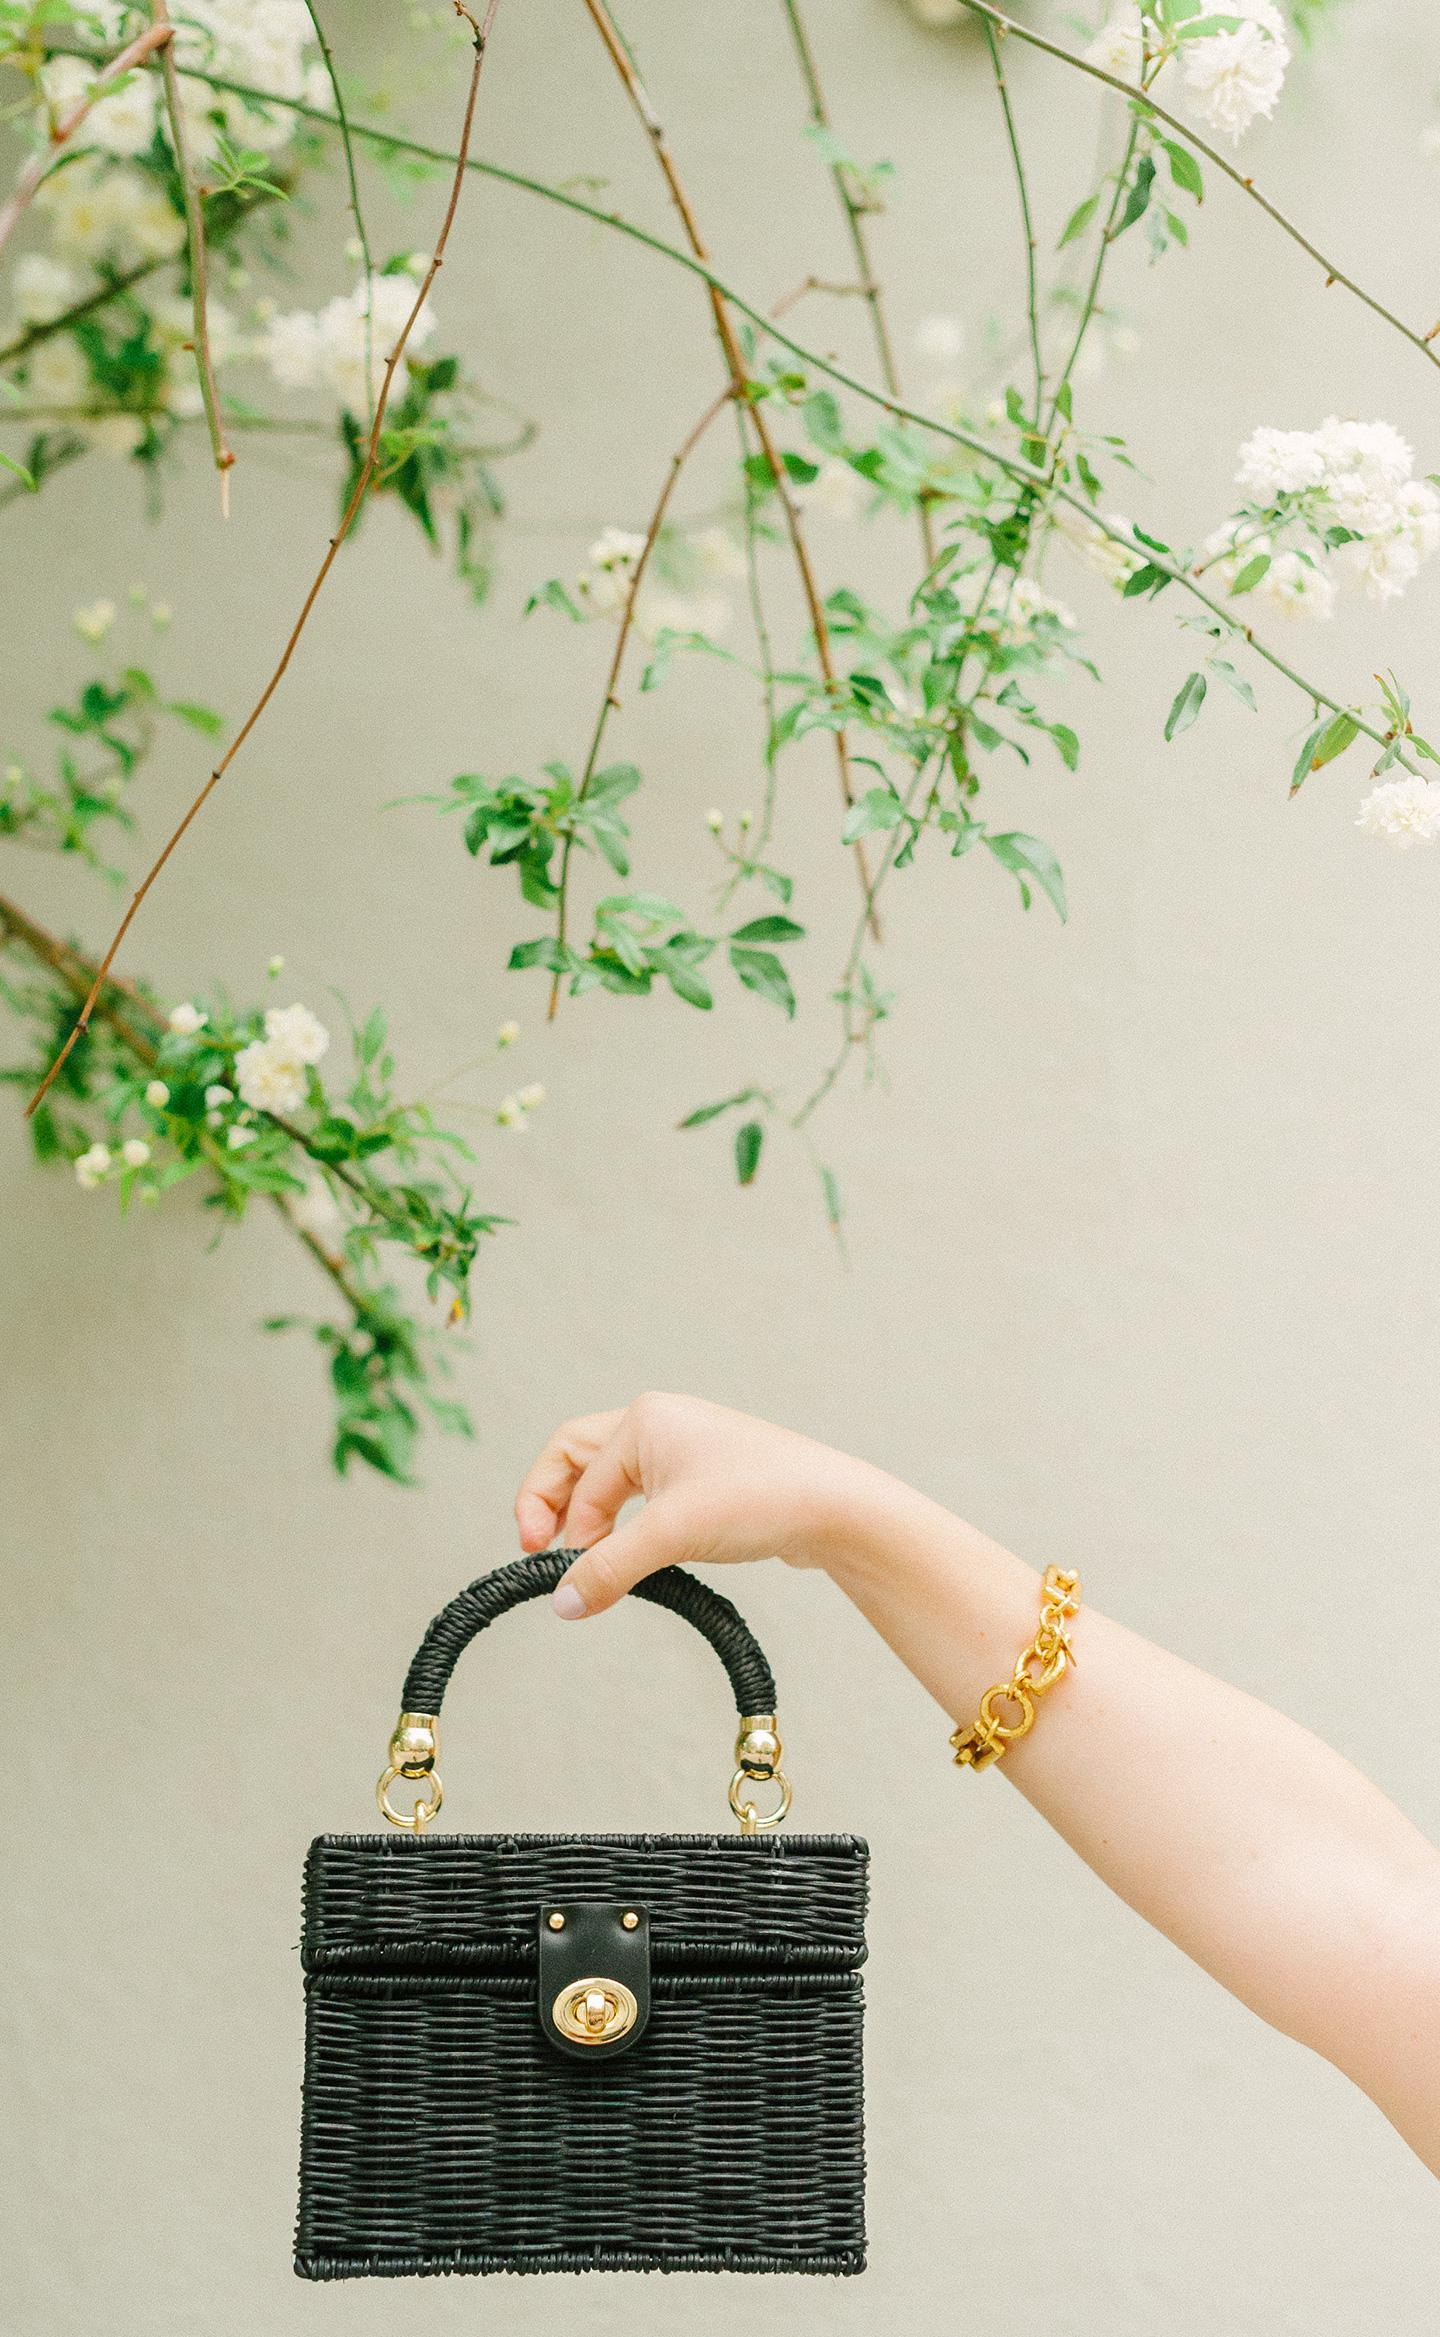 Black Straw Top Handle Bag